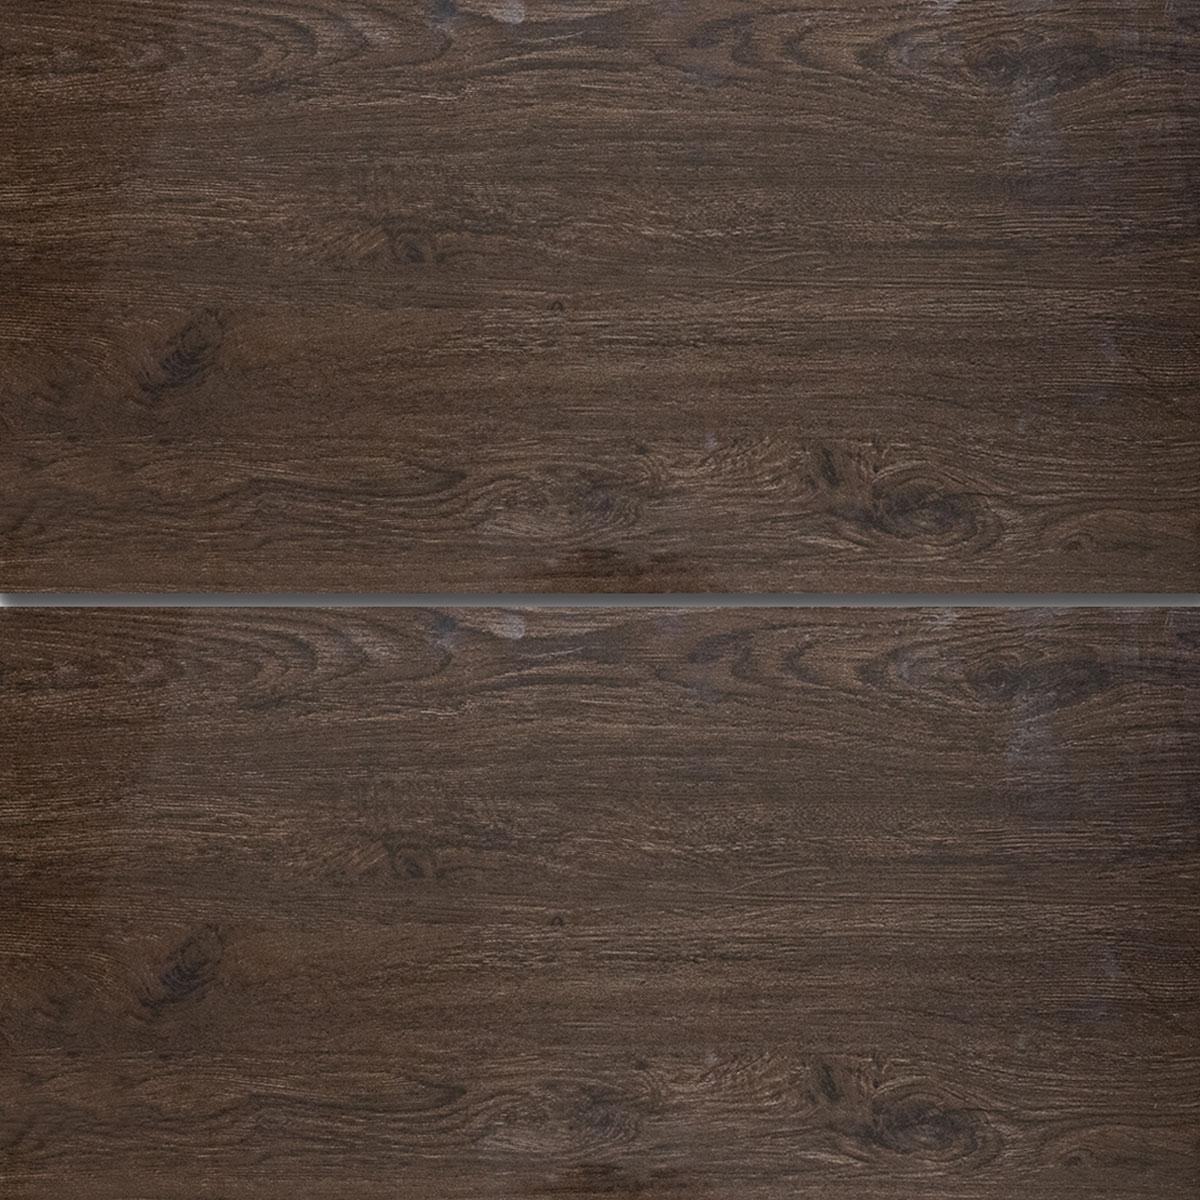 T10033 amani oak polished 1